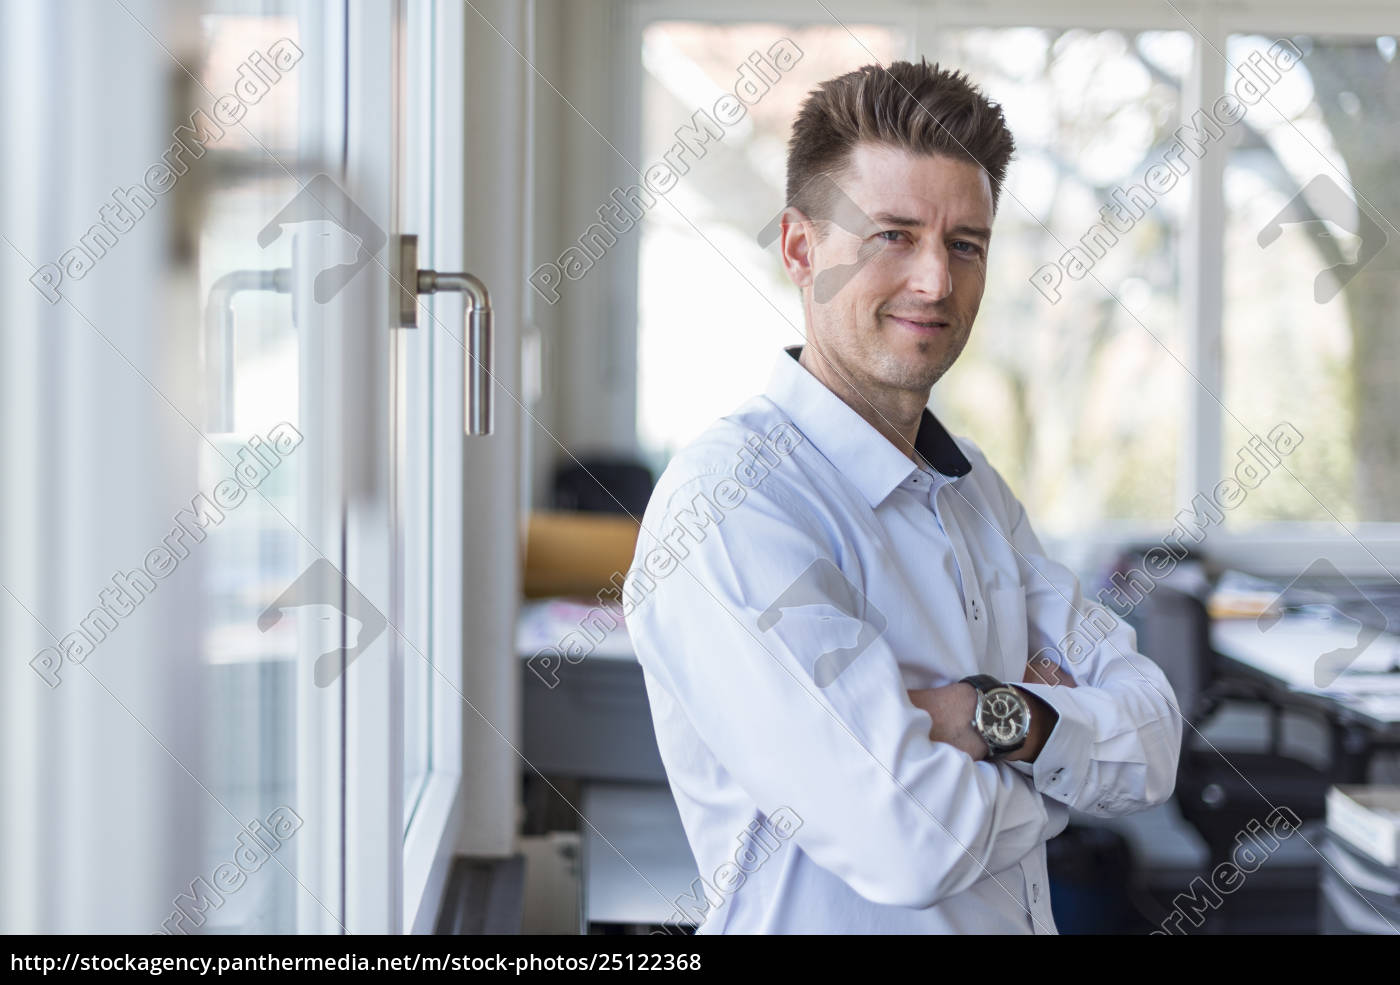 portrait, of, a, successful, businessman, standing - 25122368